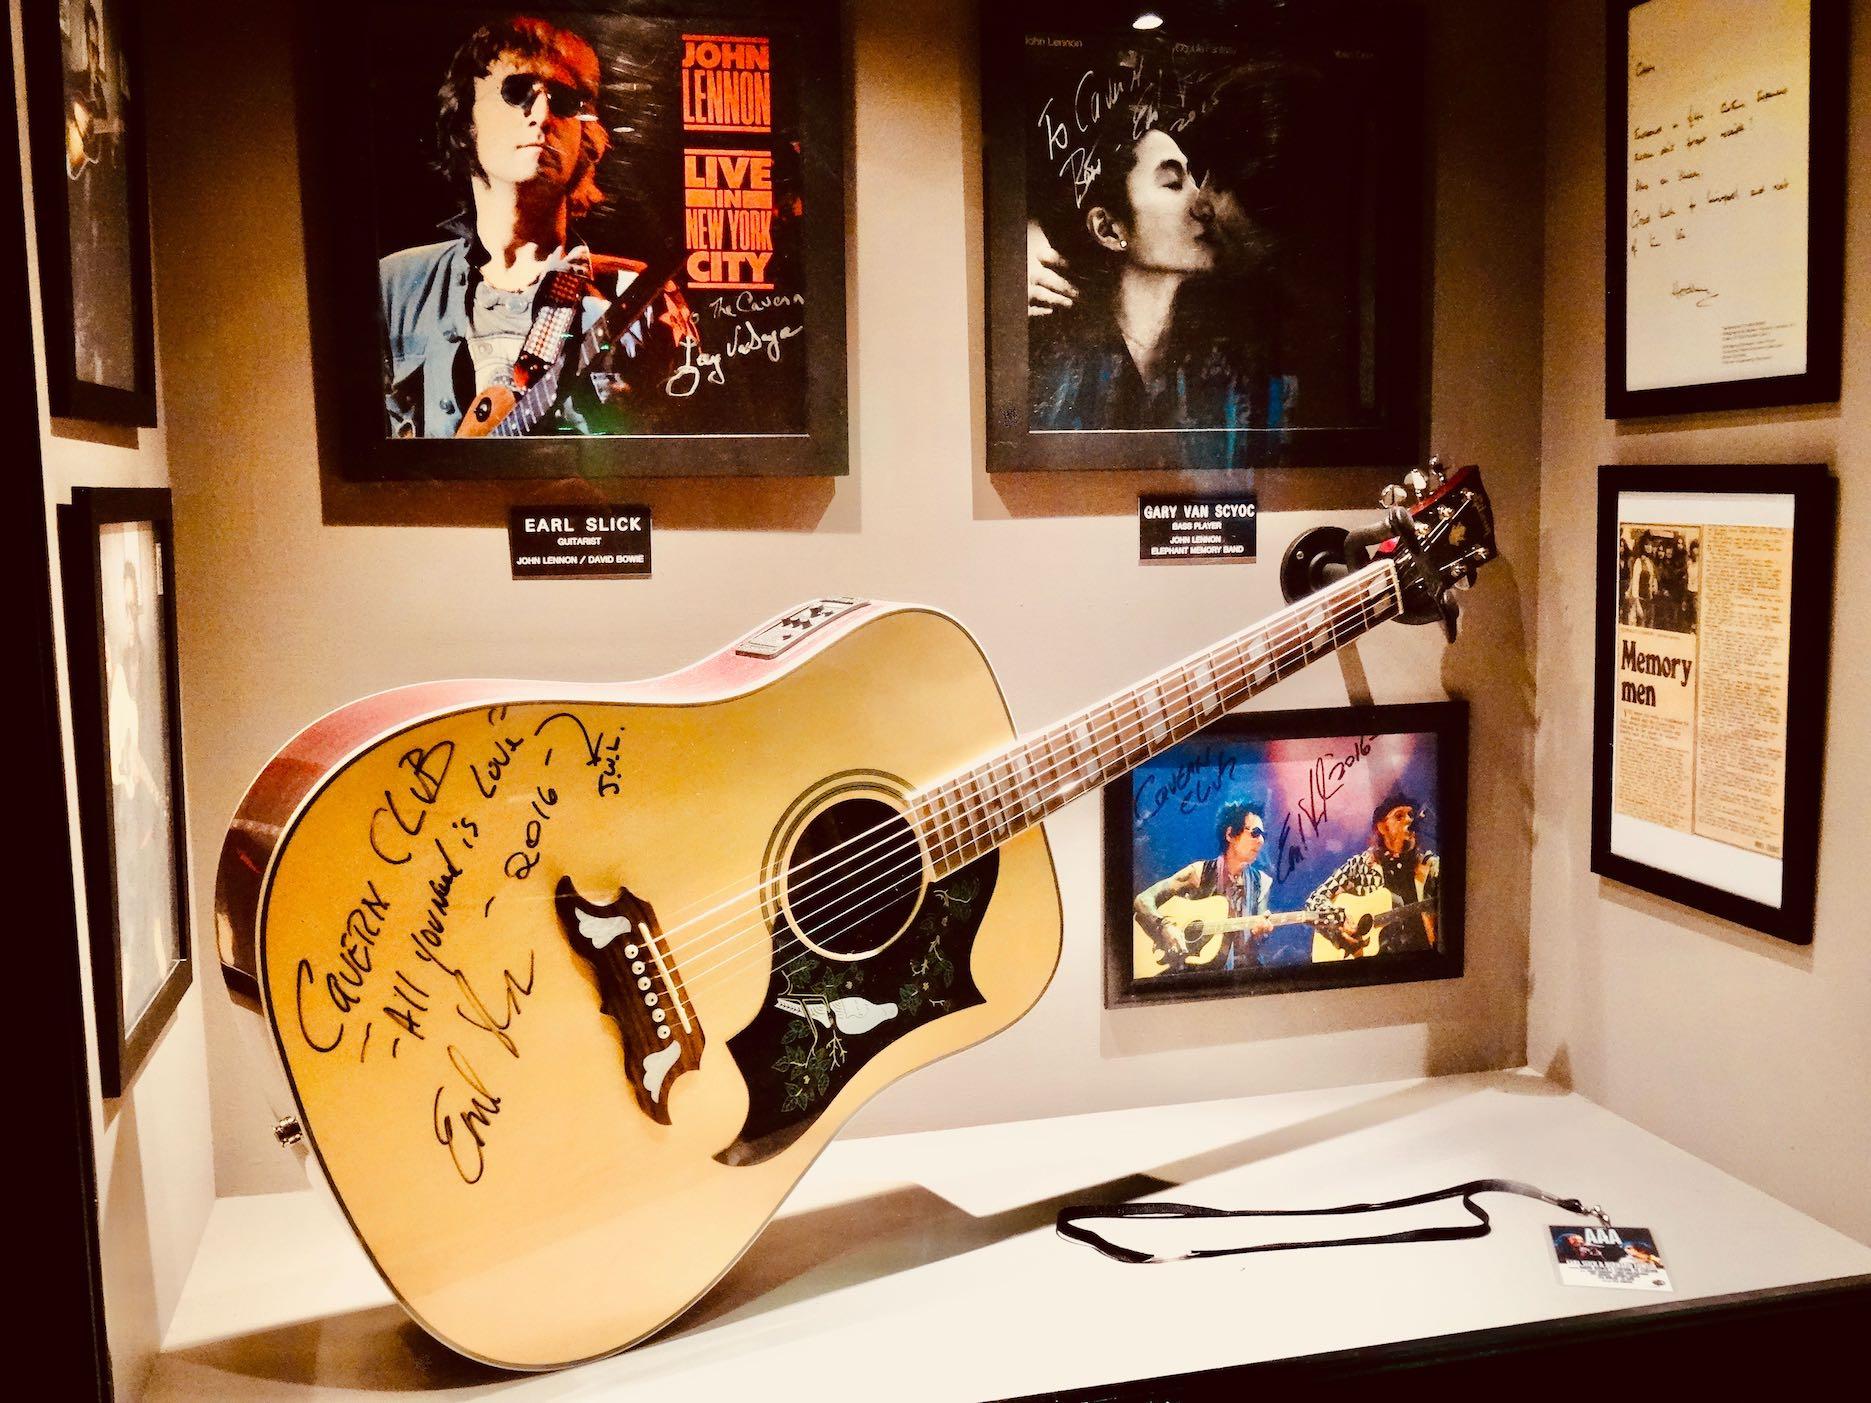 Signed rock memorabilia Cavern Pub Liverpool